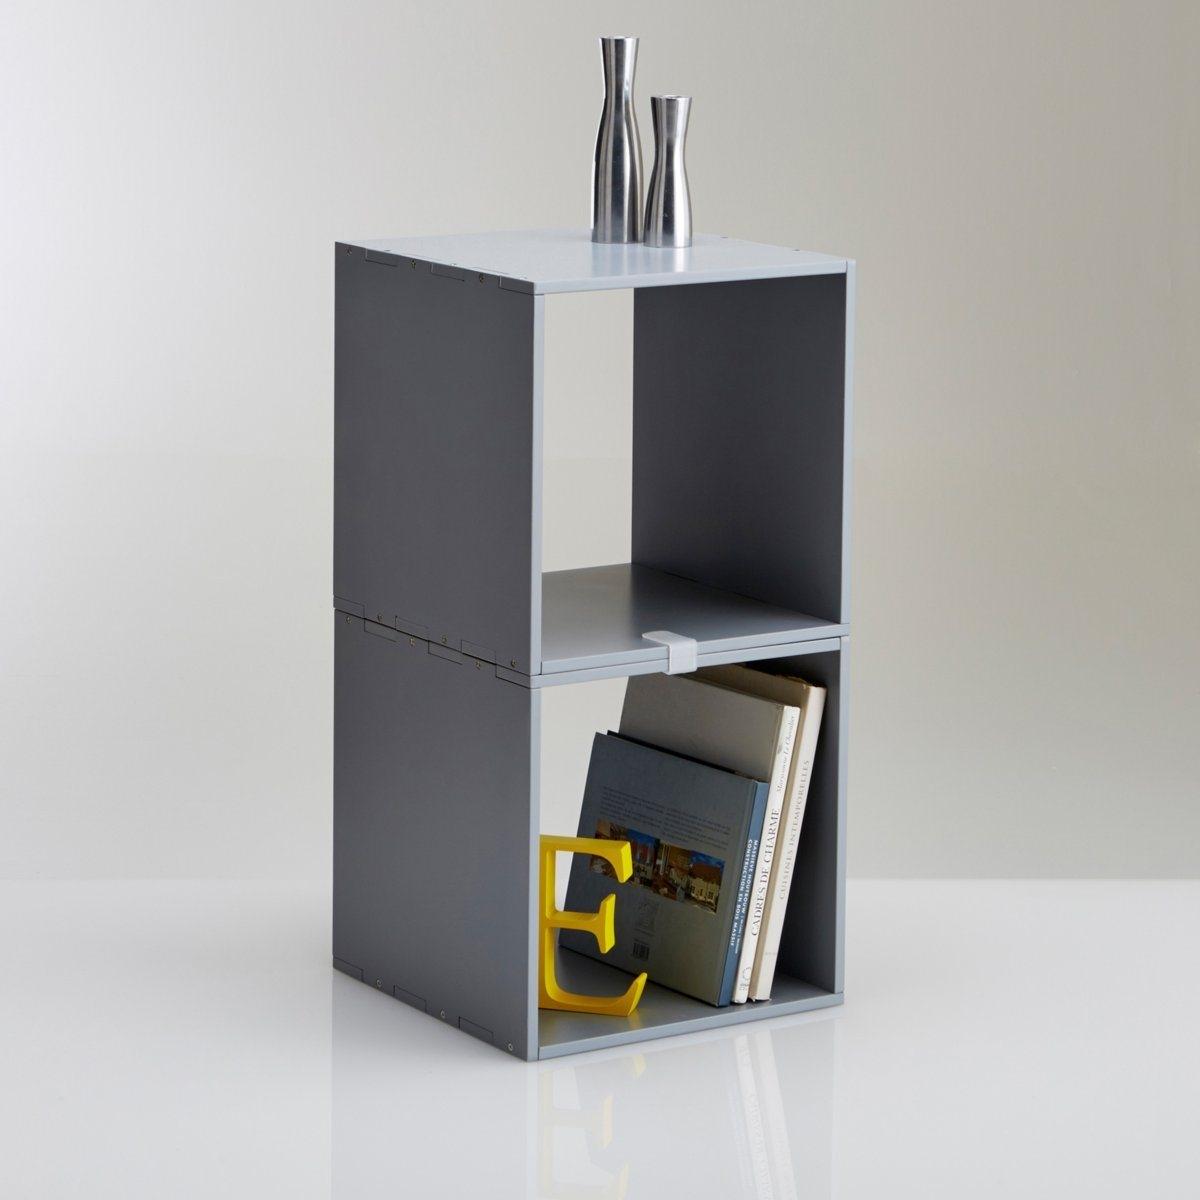 Ящик для хранения (комплект из 2), Meeting от La Redoute